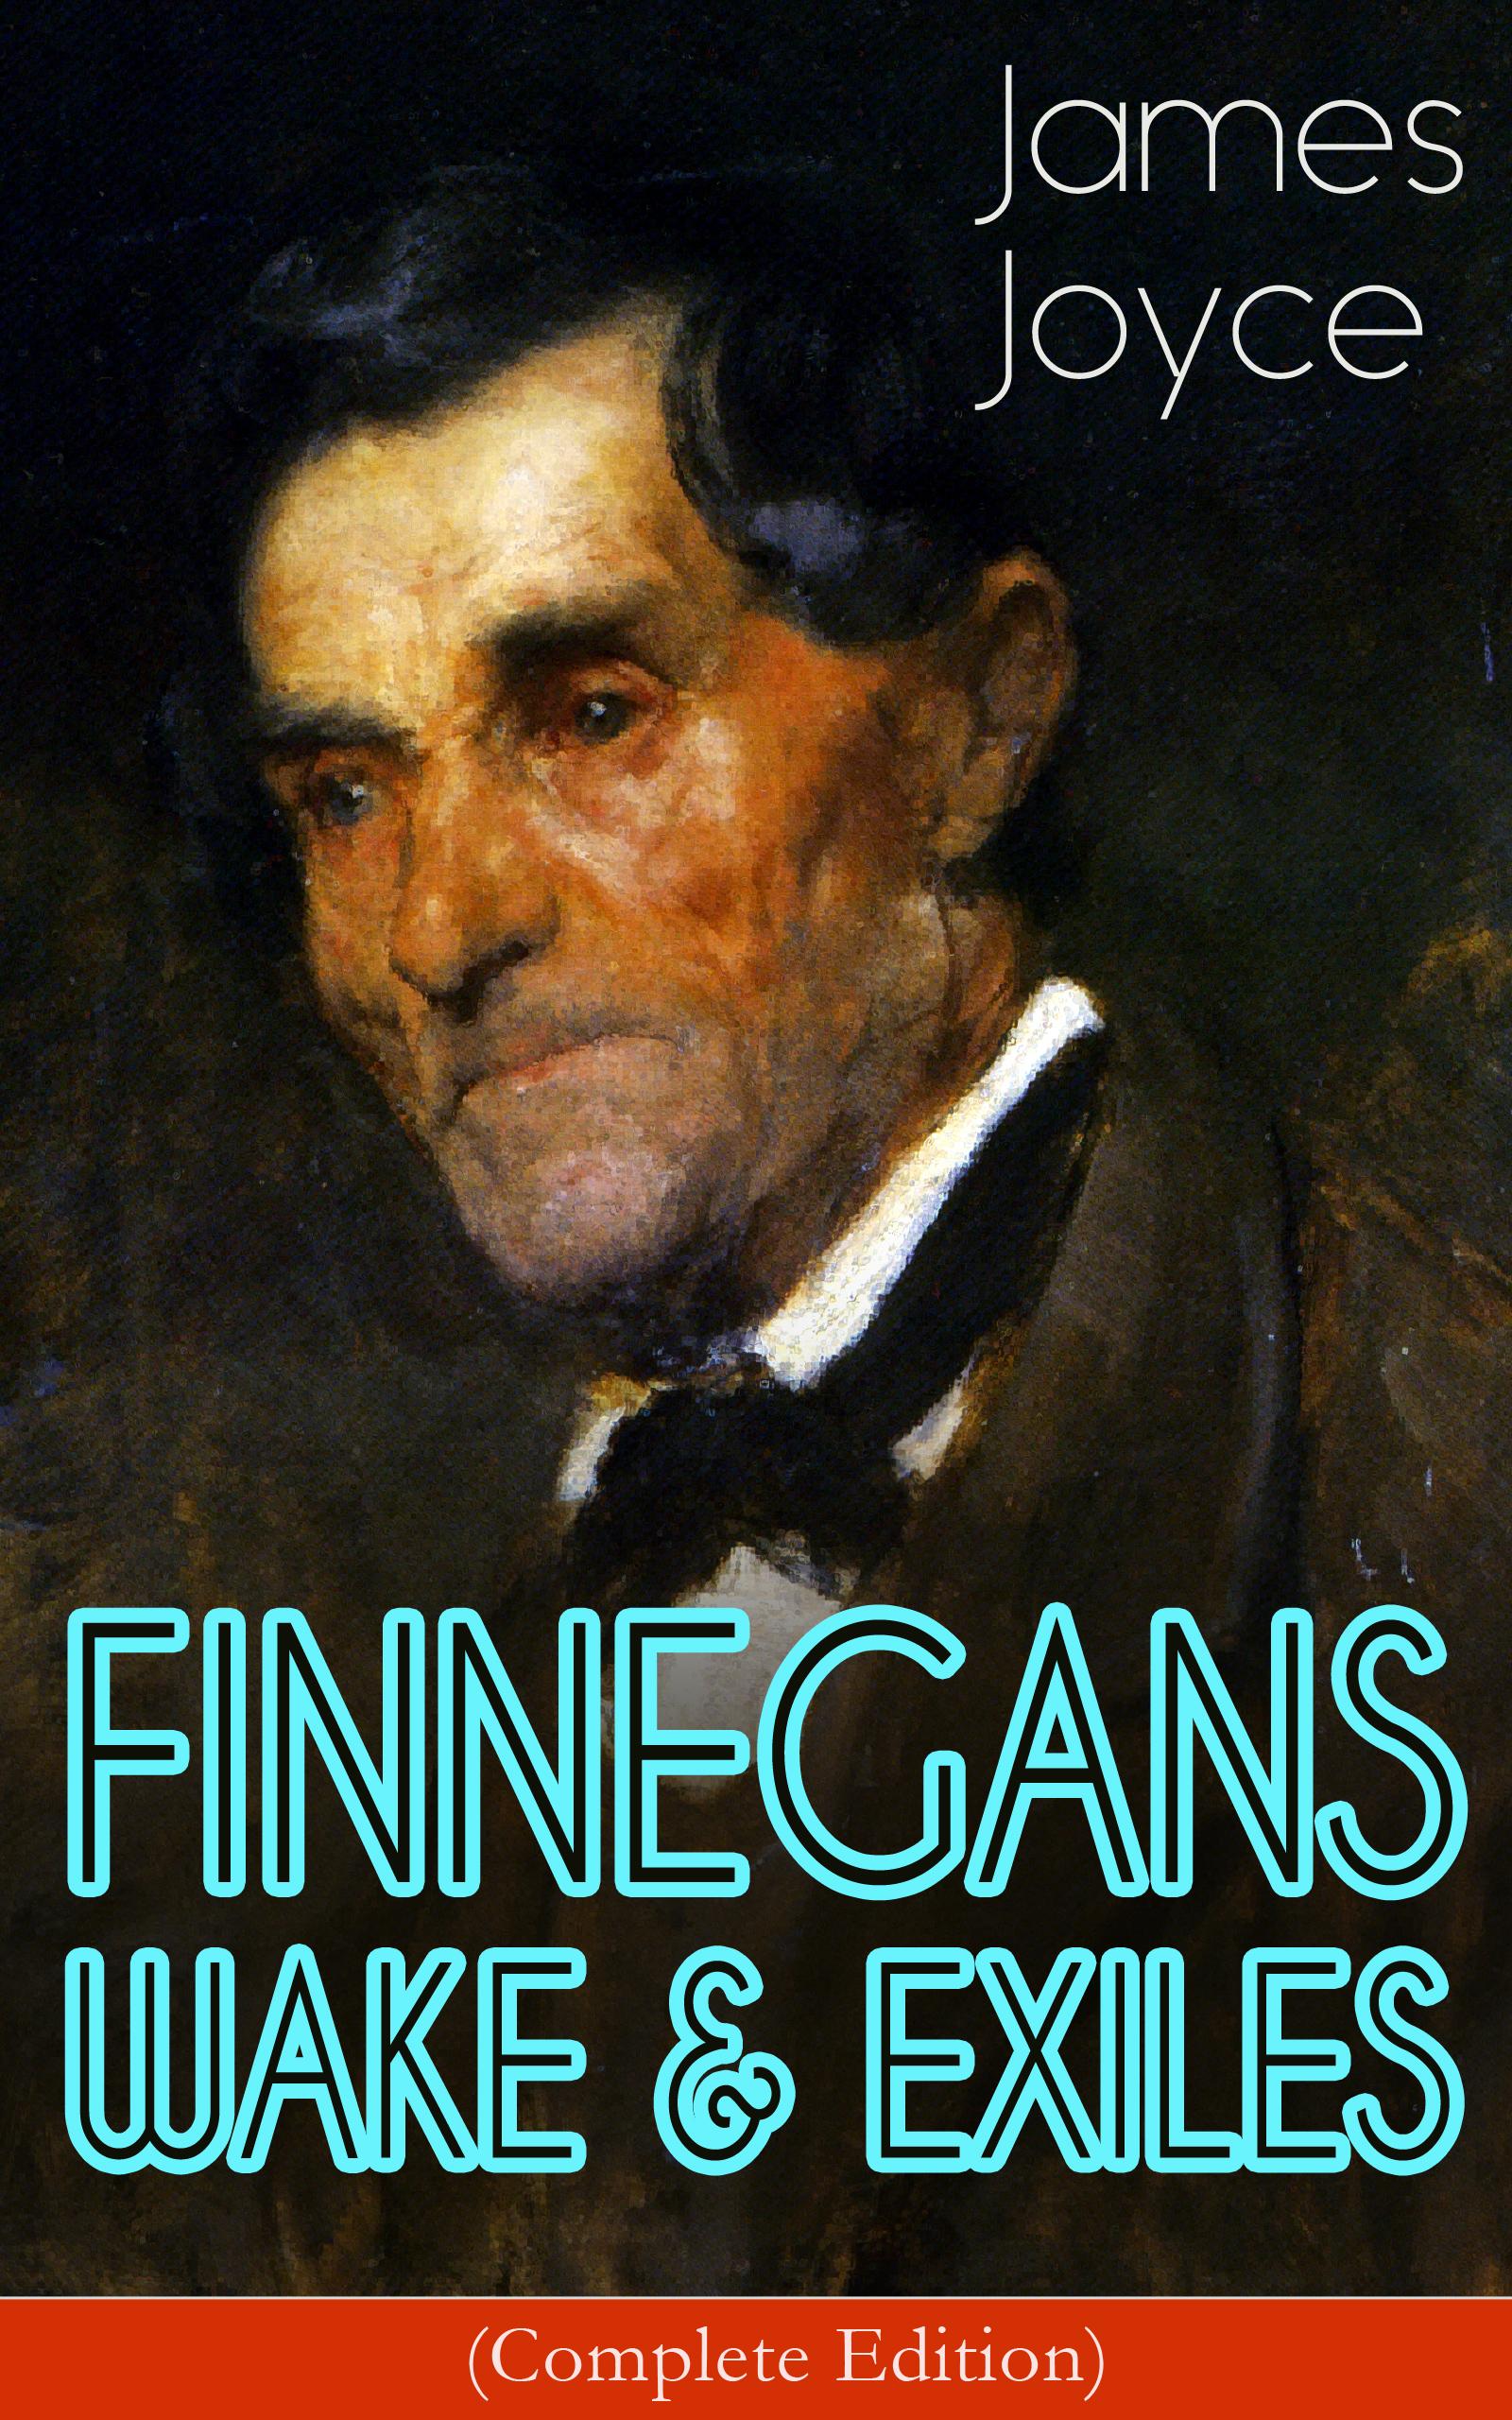 цена Джеймс Джойс FINNEGANS WAKE & EXILES (Complete Edition) онлайн в 2017 году